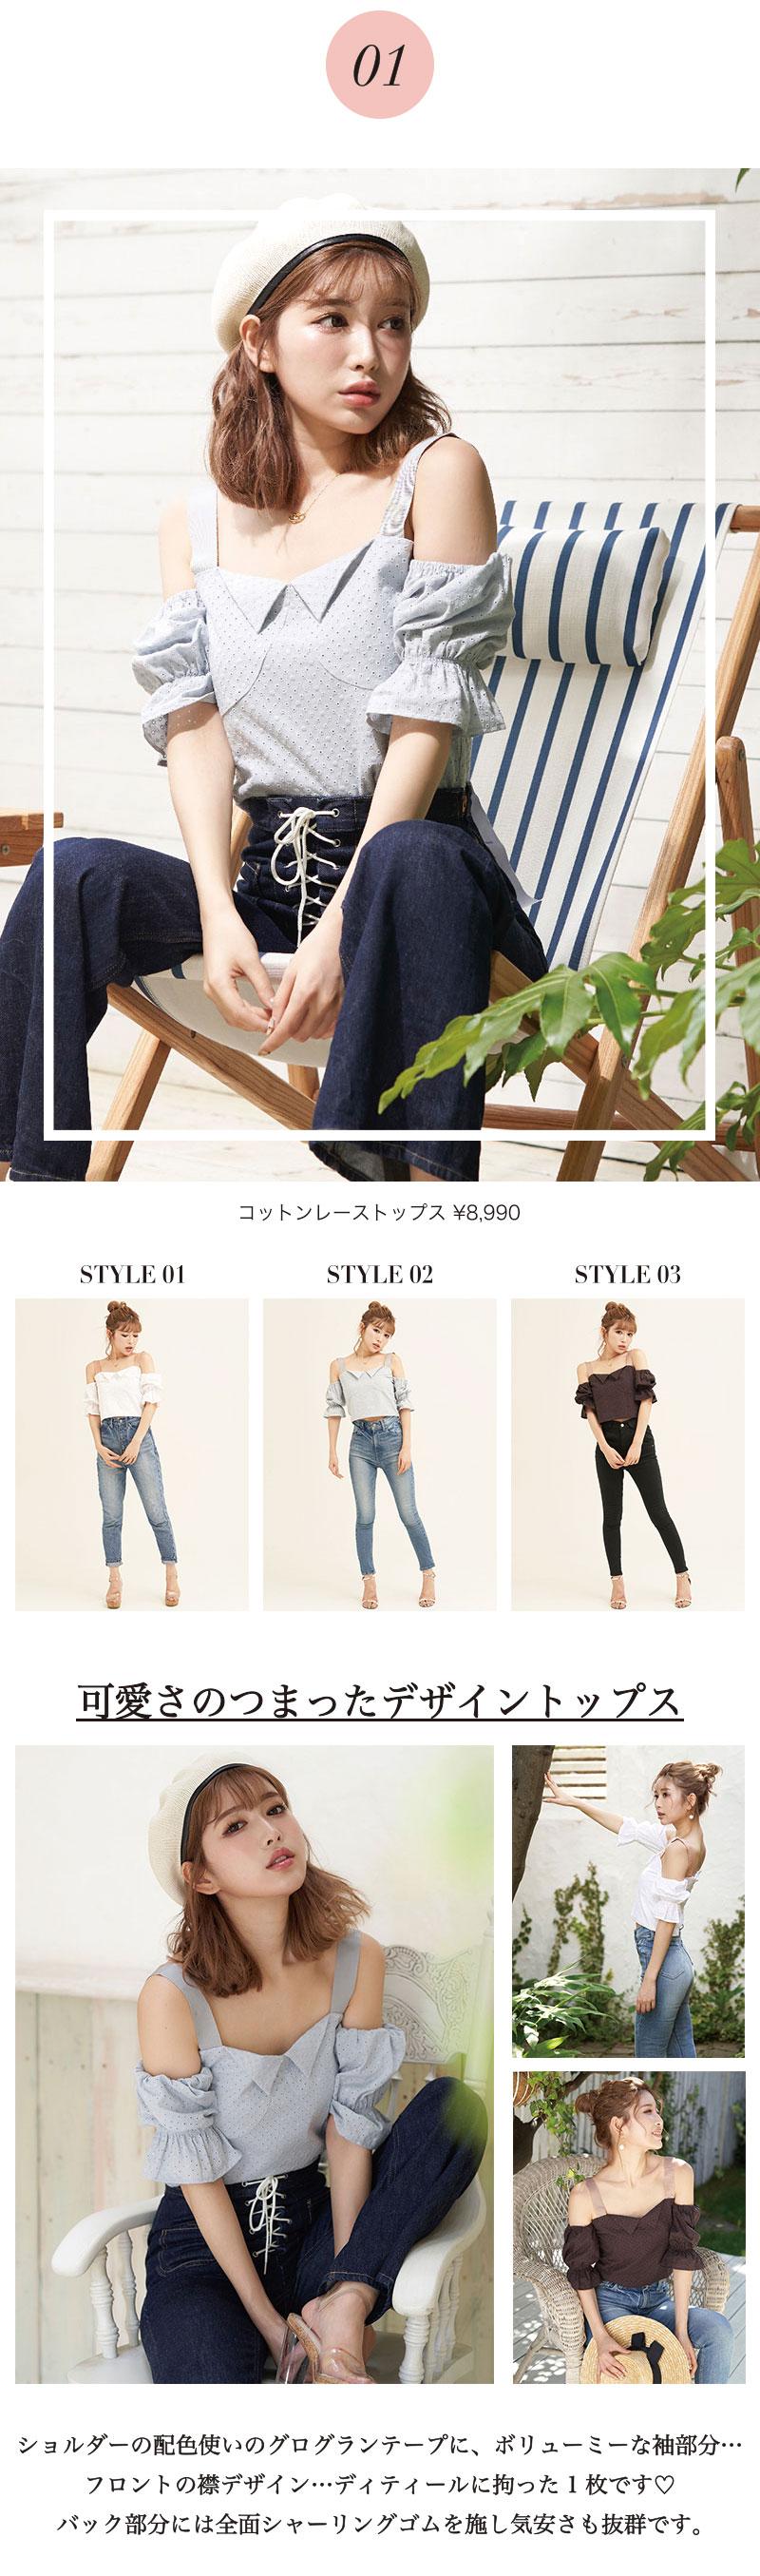 18SS トップスコレクション特集3